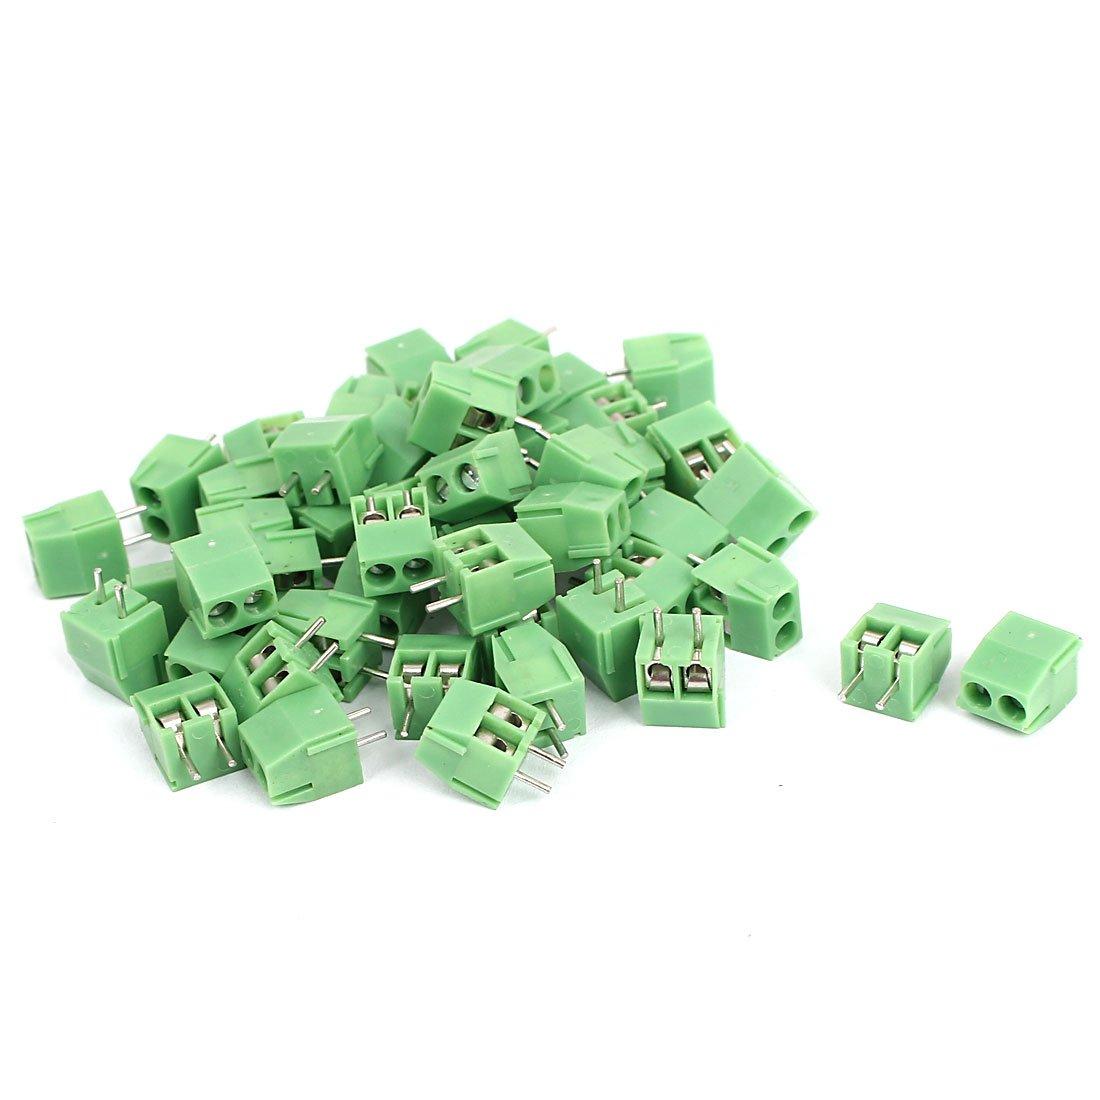 uxcell 50 Pcs 2 Pin Screw Terminal Block 3.5mm Pitch Panel PCB Mount Green